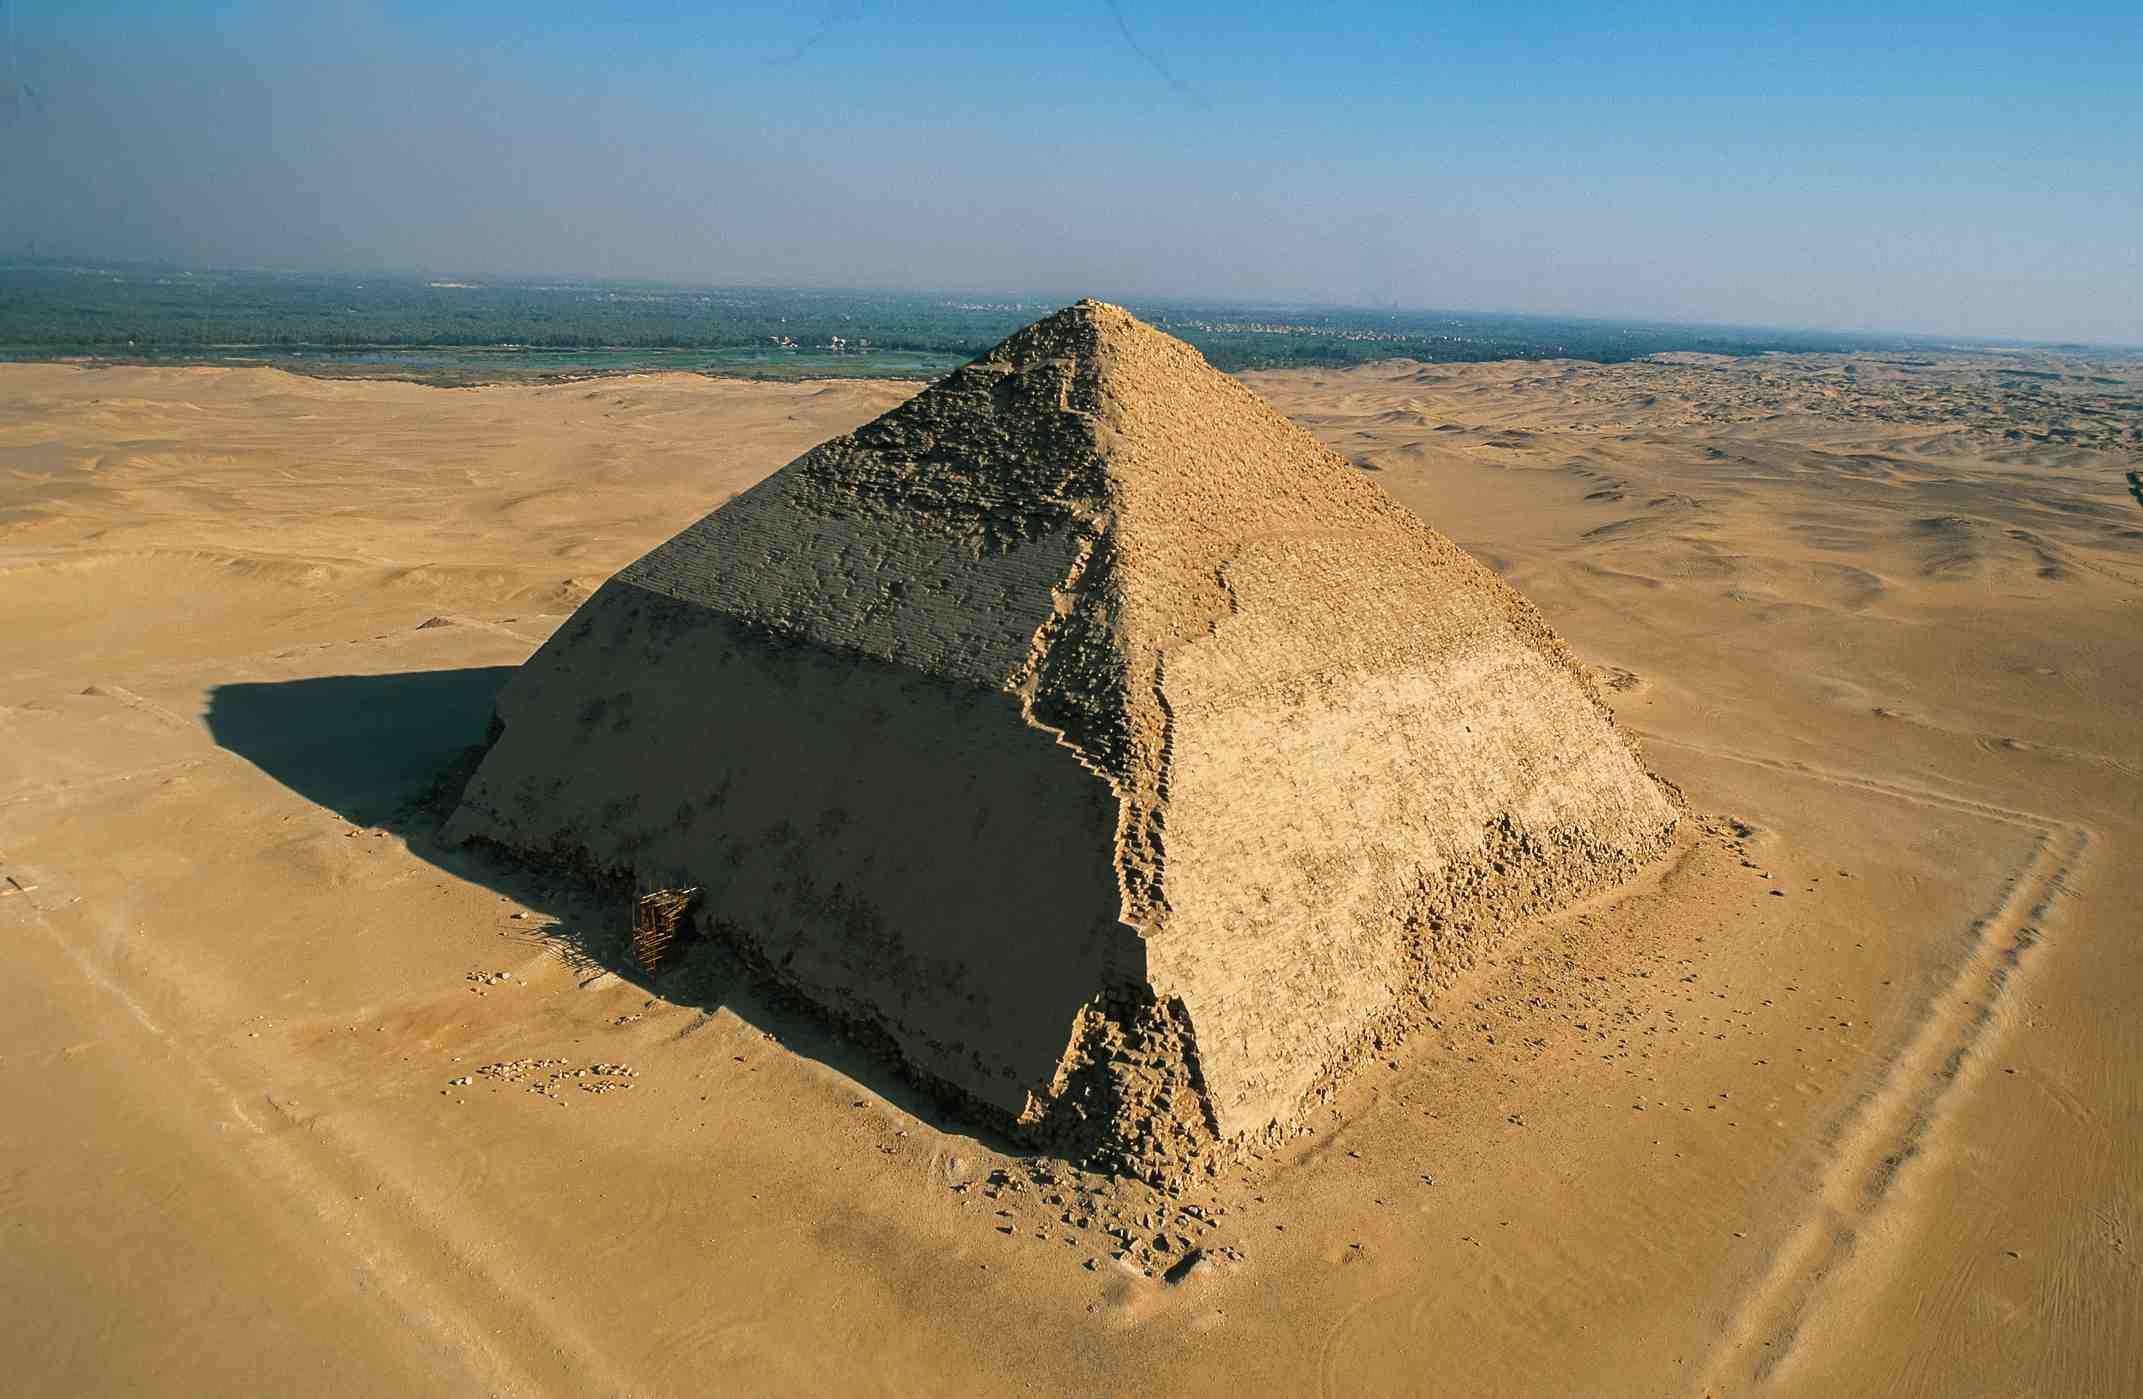 Bent Pyramid of Snefru, south of Cairo, Dahshur necropolis, Giza Governorate, Egypt